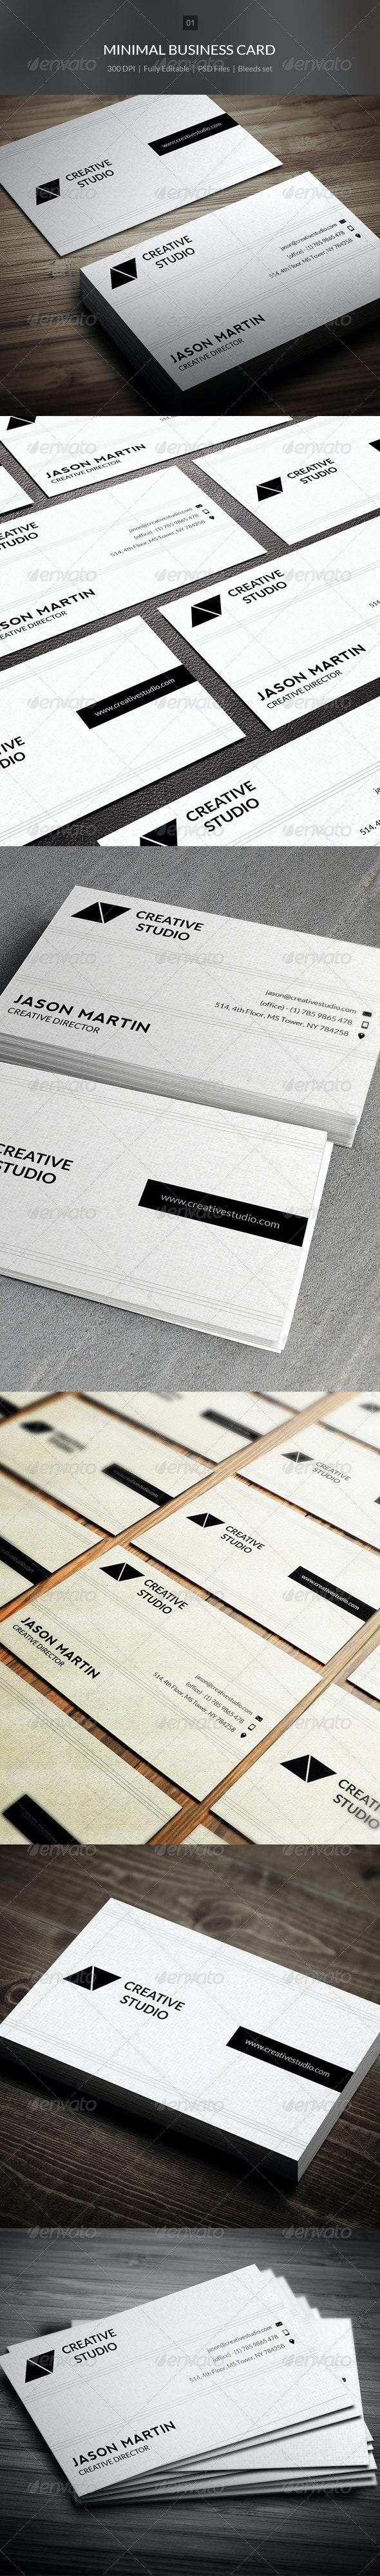 Minimal Business Card - 01 - Creative Business Cards